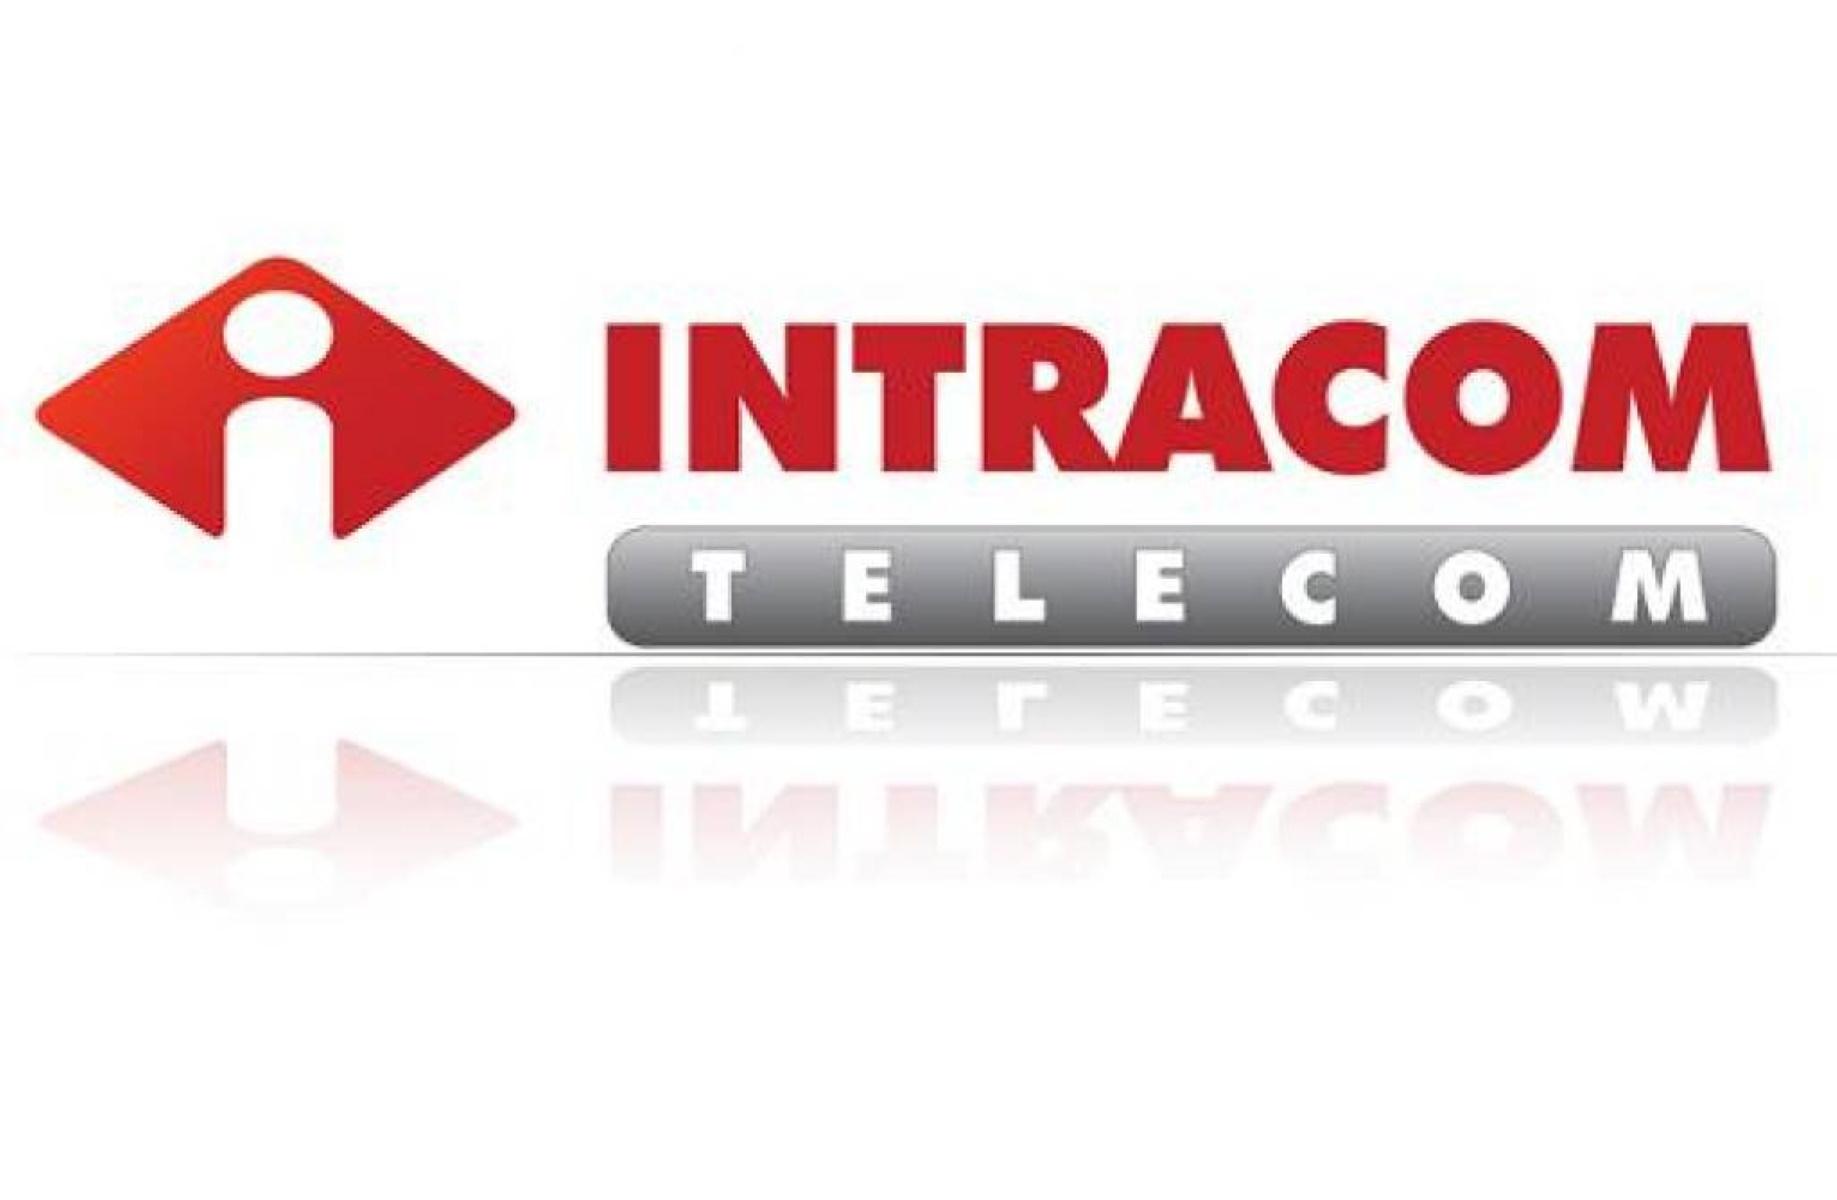 Intracom Telecom: Υλοποιεί έργο της Wind Hellas για διαδικτυακή ασφάλεια